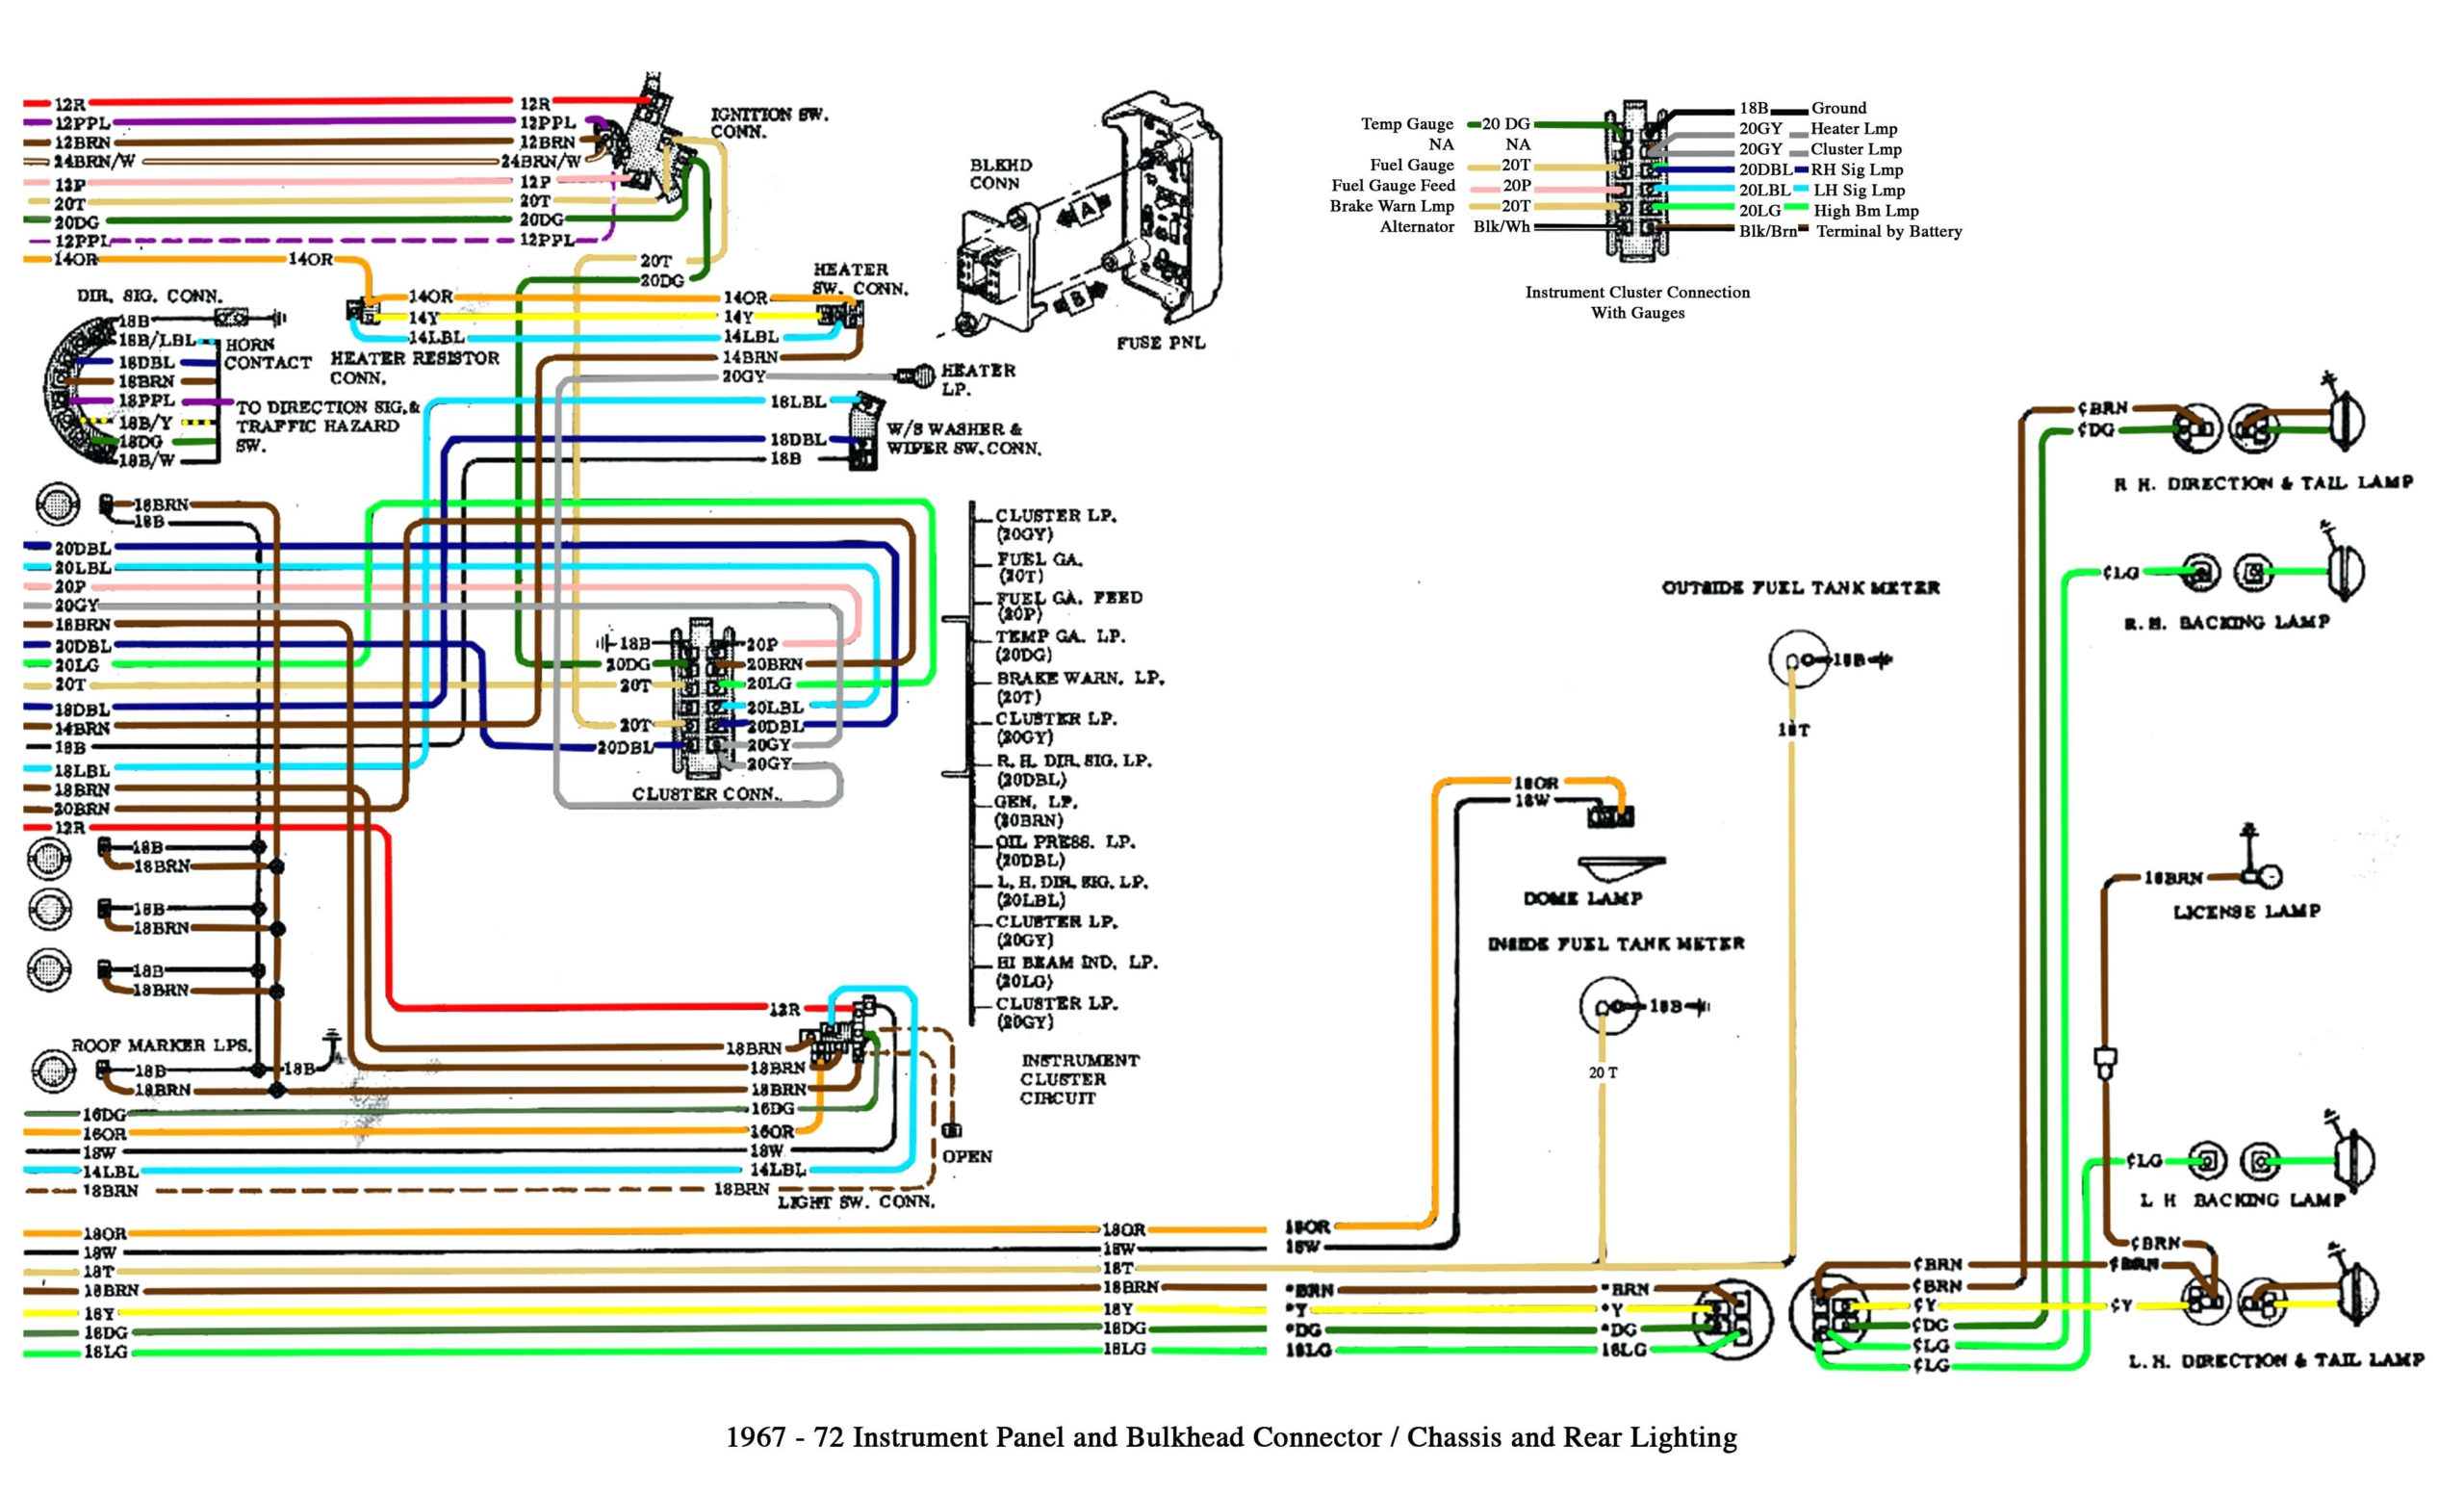 2005 Chevy Silverado 7 Pin Trailer Wiring Diagram